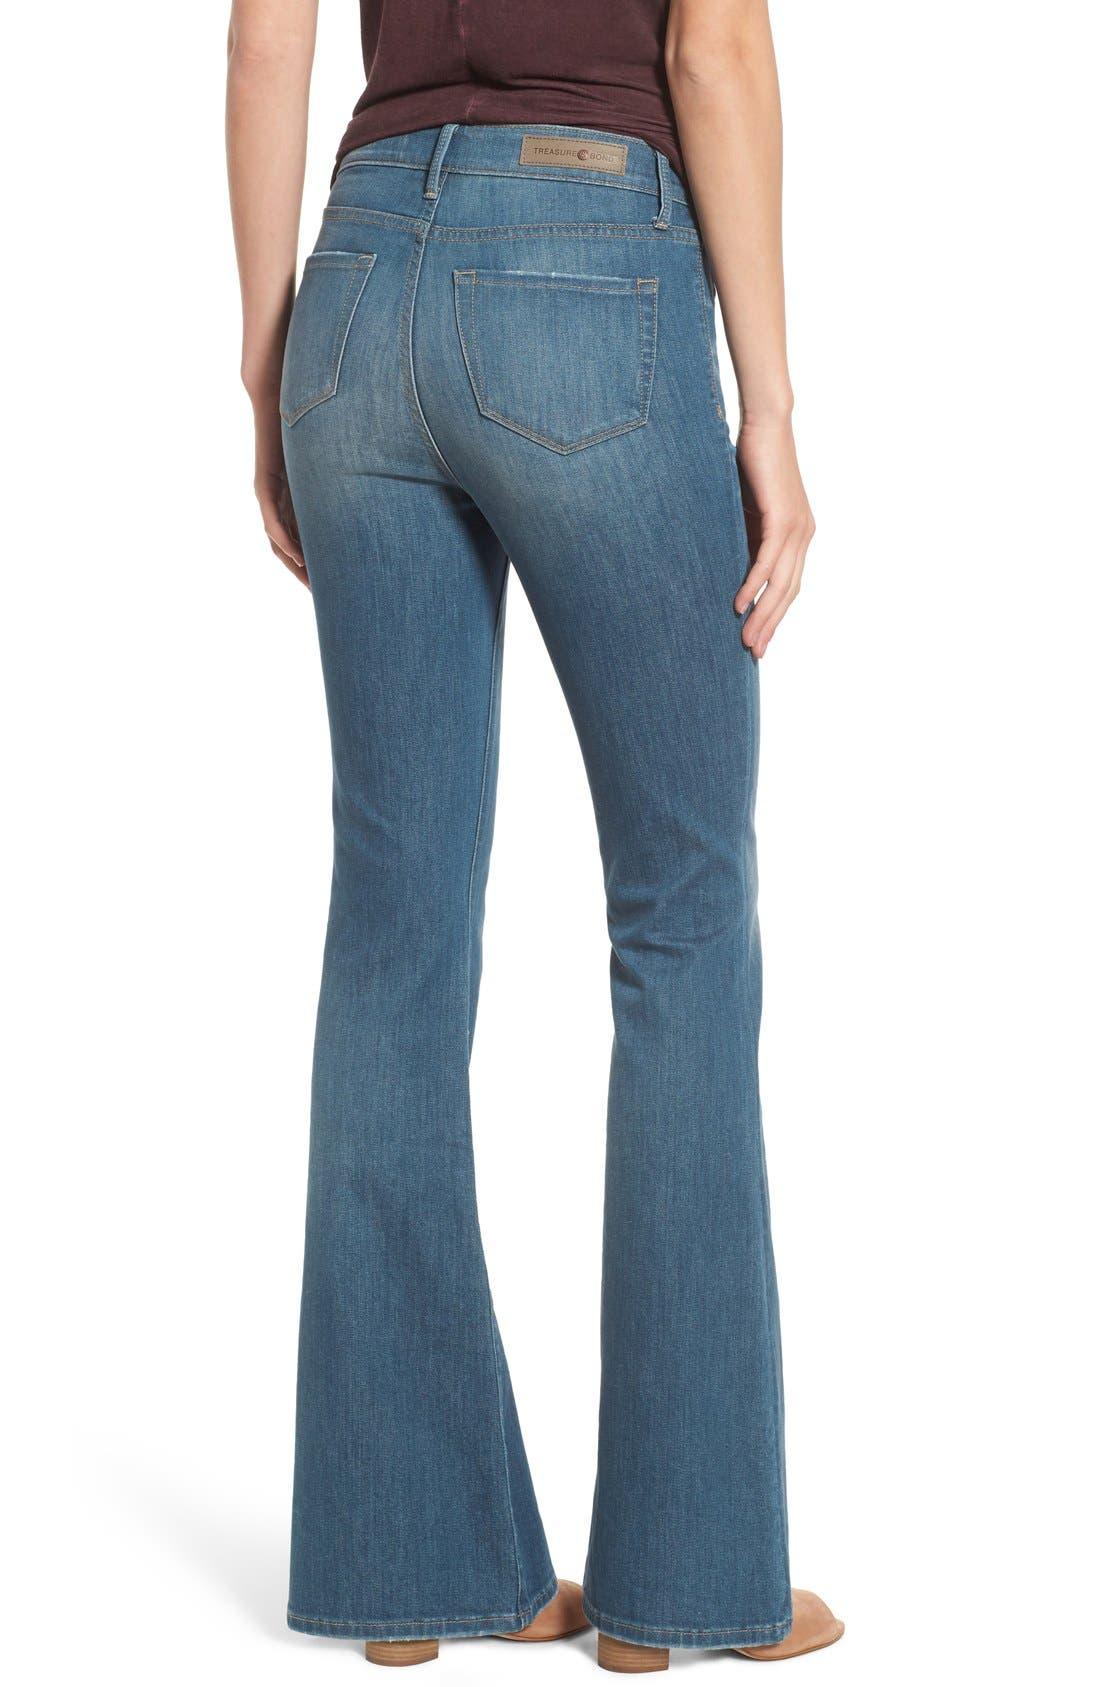 Treasure&Bond High Rise Skinny Flare Jeans,                             Alternate thumbnail 5, color,                             400